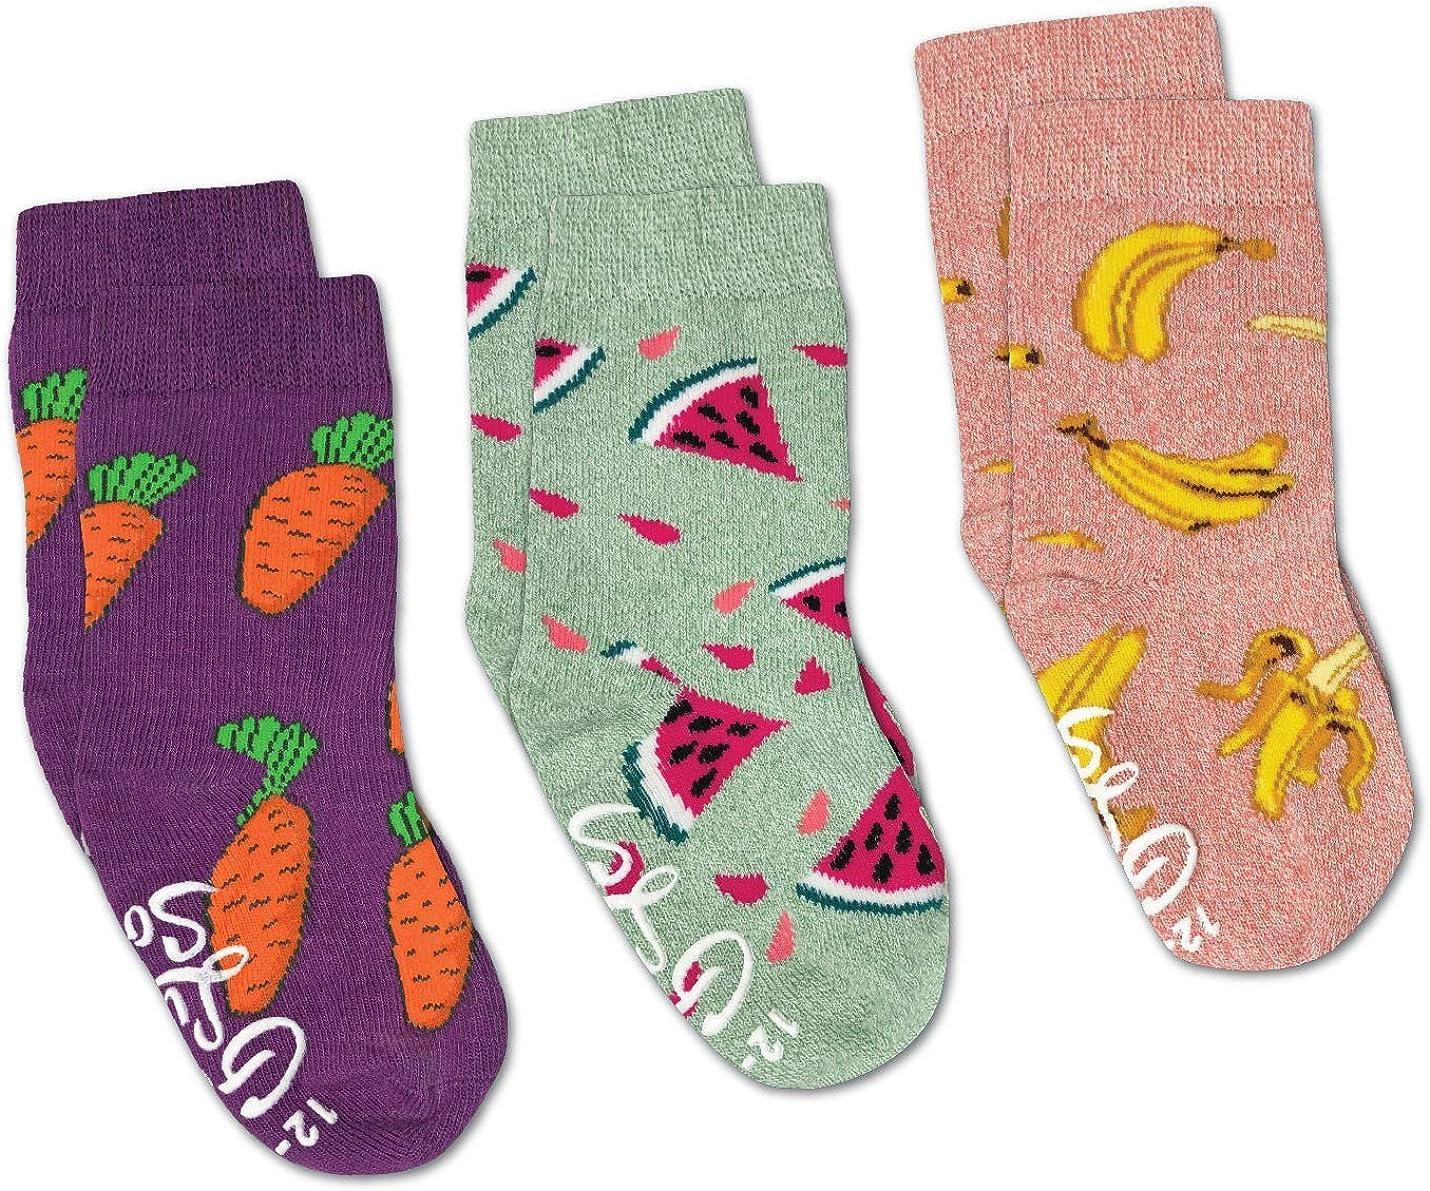 Bananas, Carrots and Watermelon Kids Toddler Socks, 3-Pack